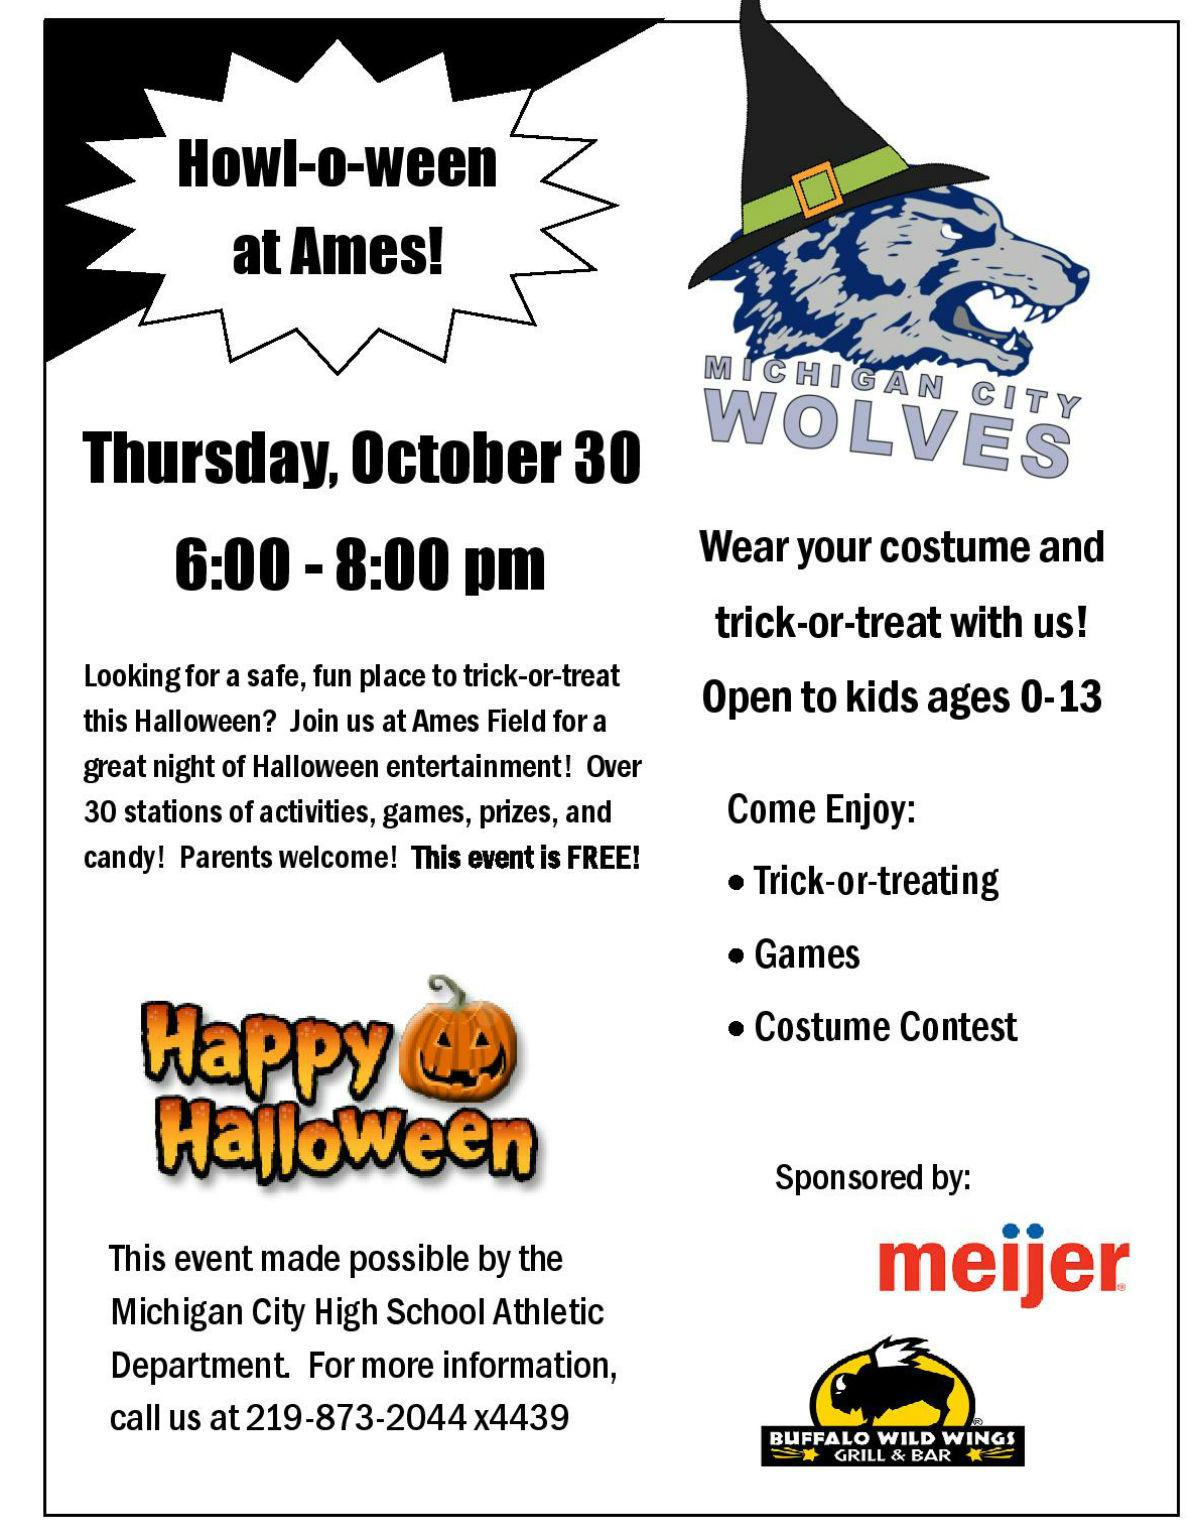 howl-o-ween-flyer